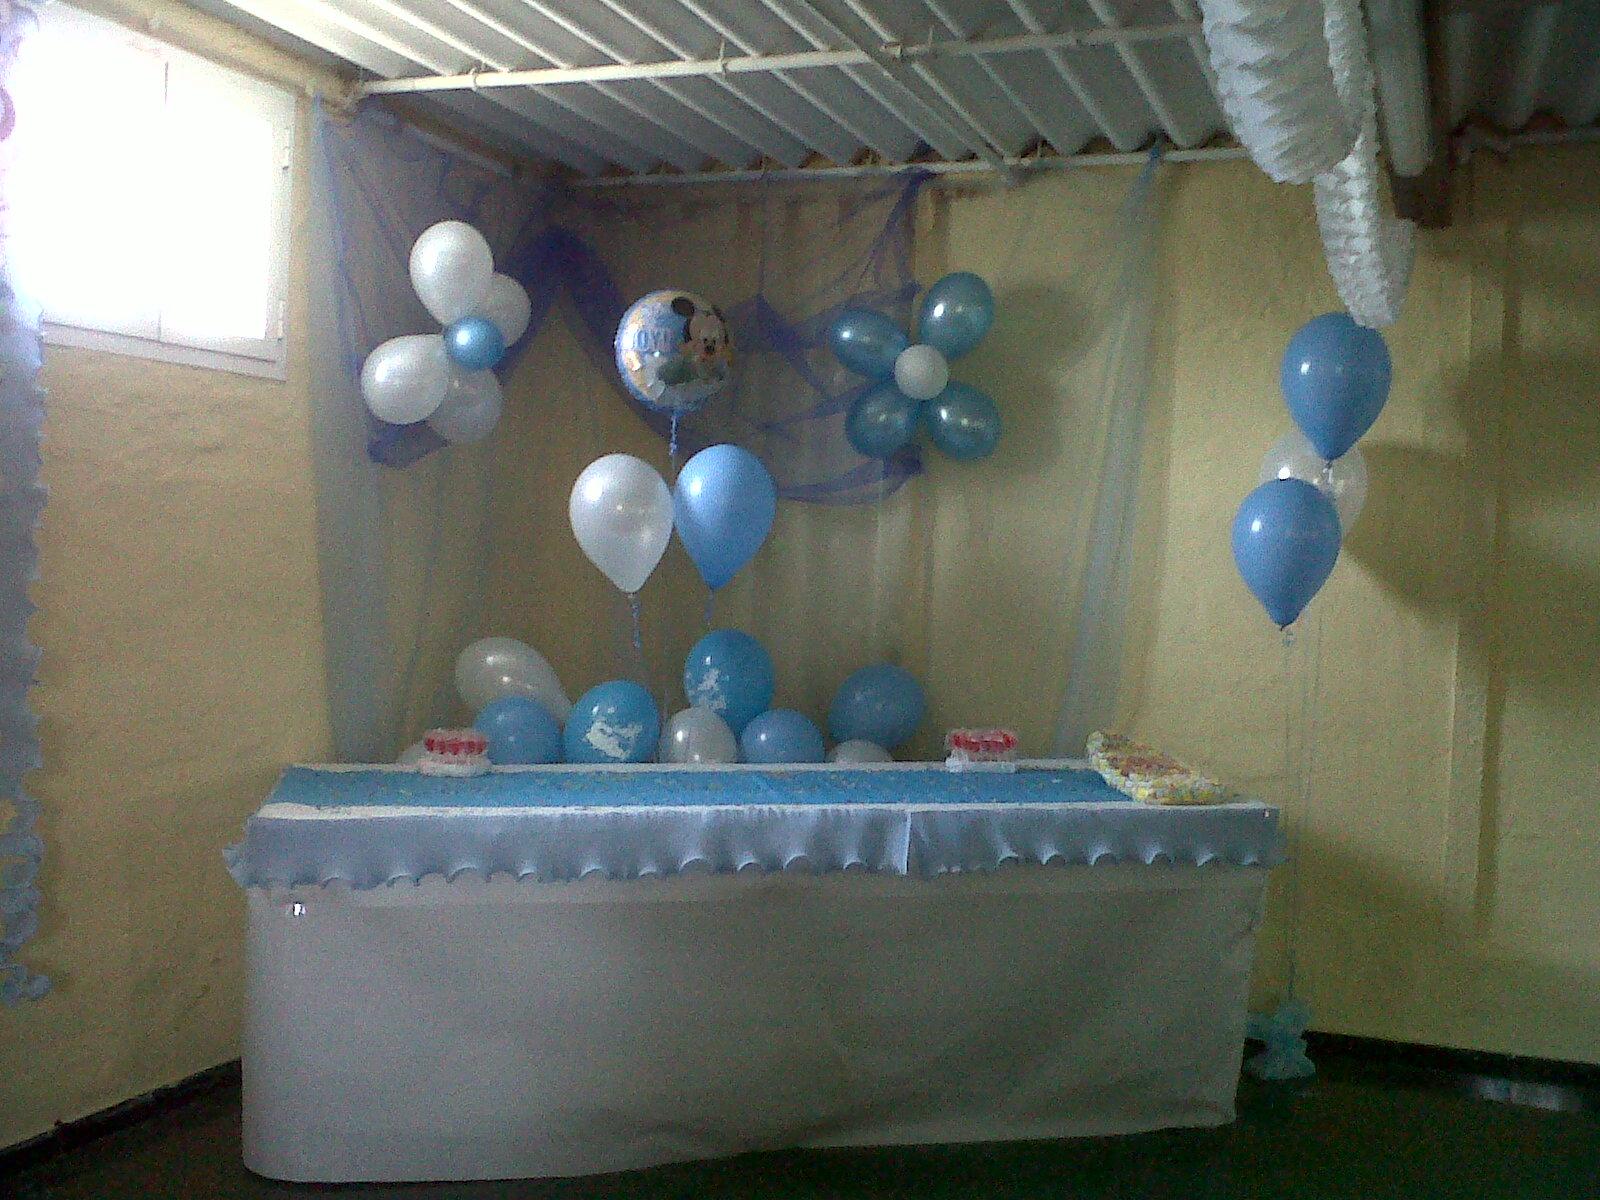 Como decorar una cesta de bautizo imagui - Como decorar un salon para bautizo ...